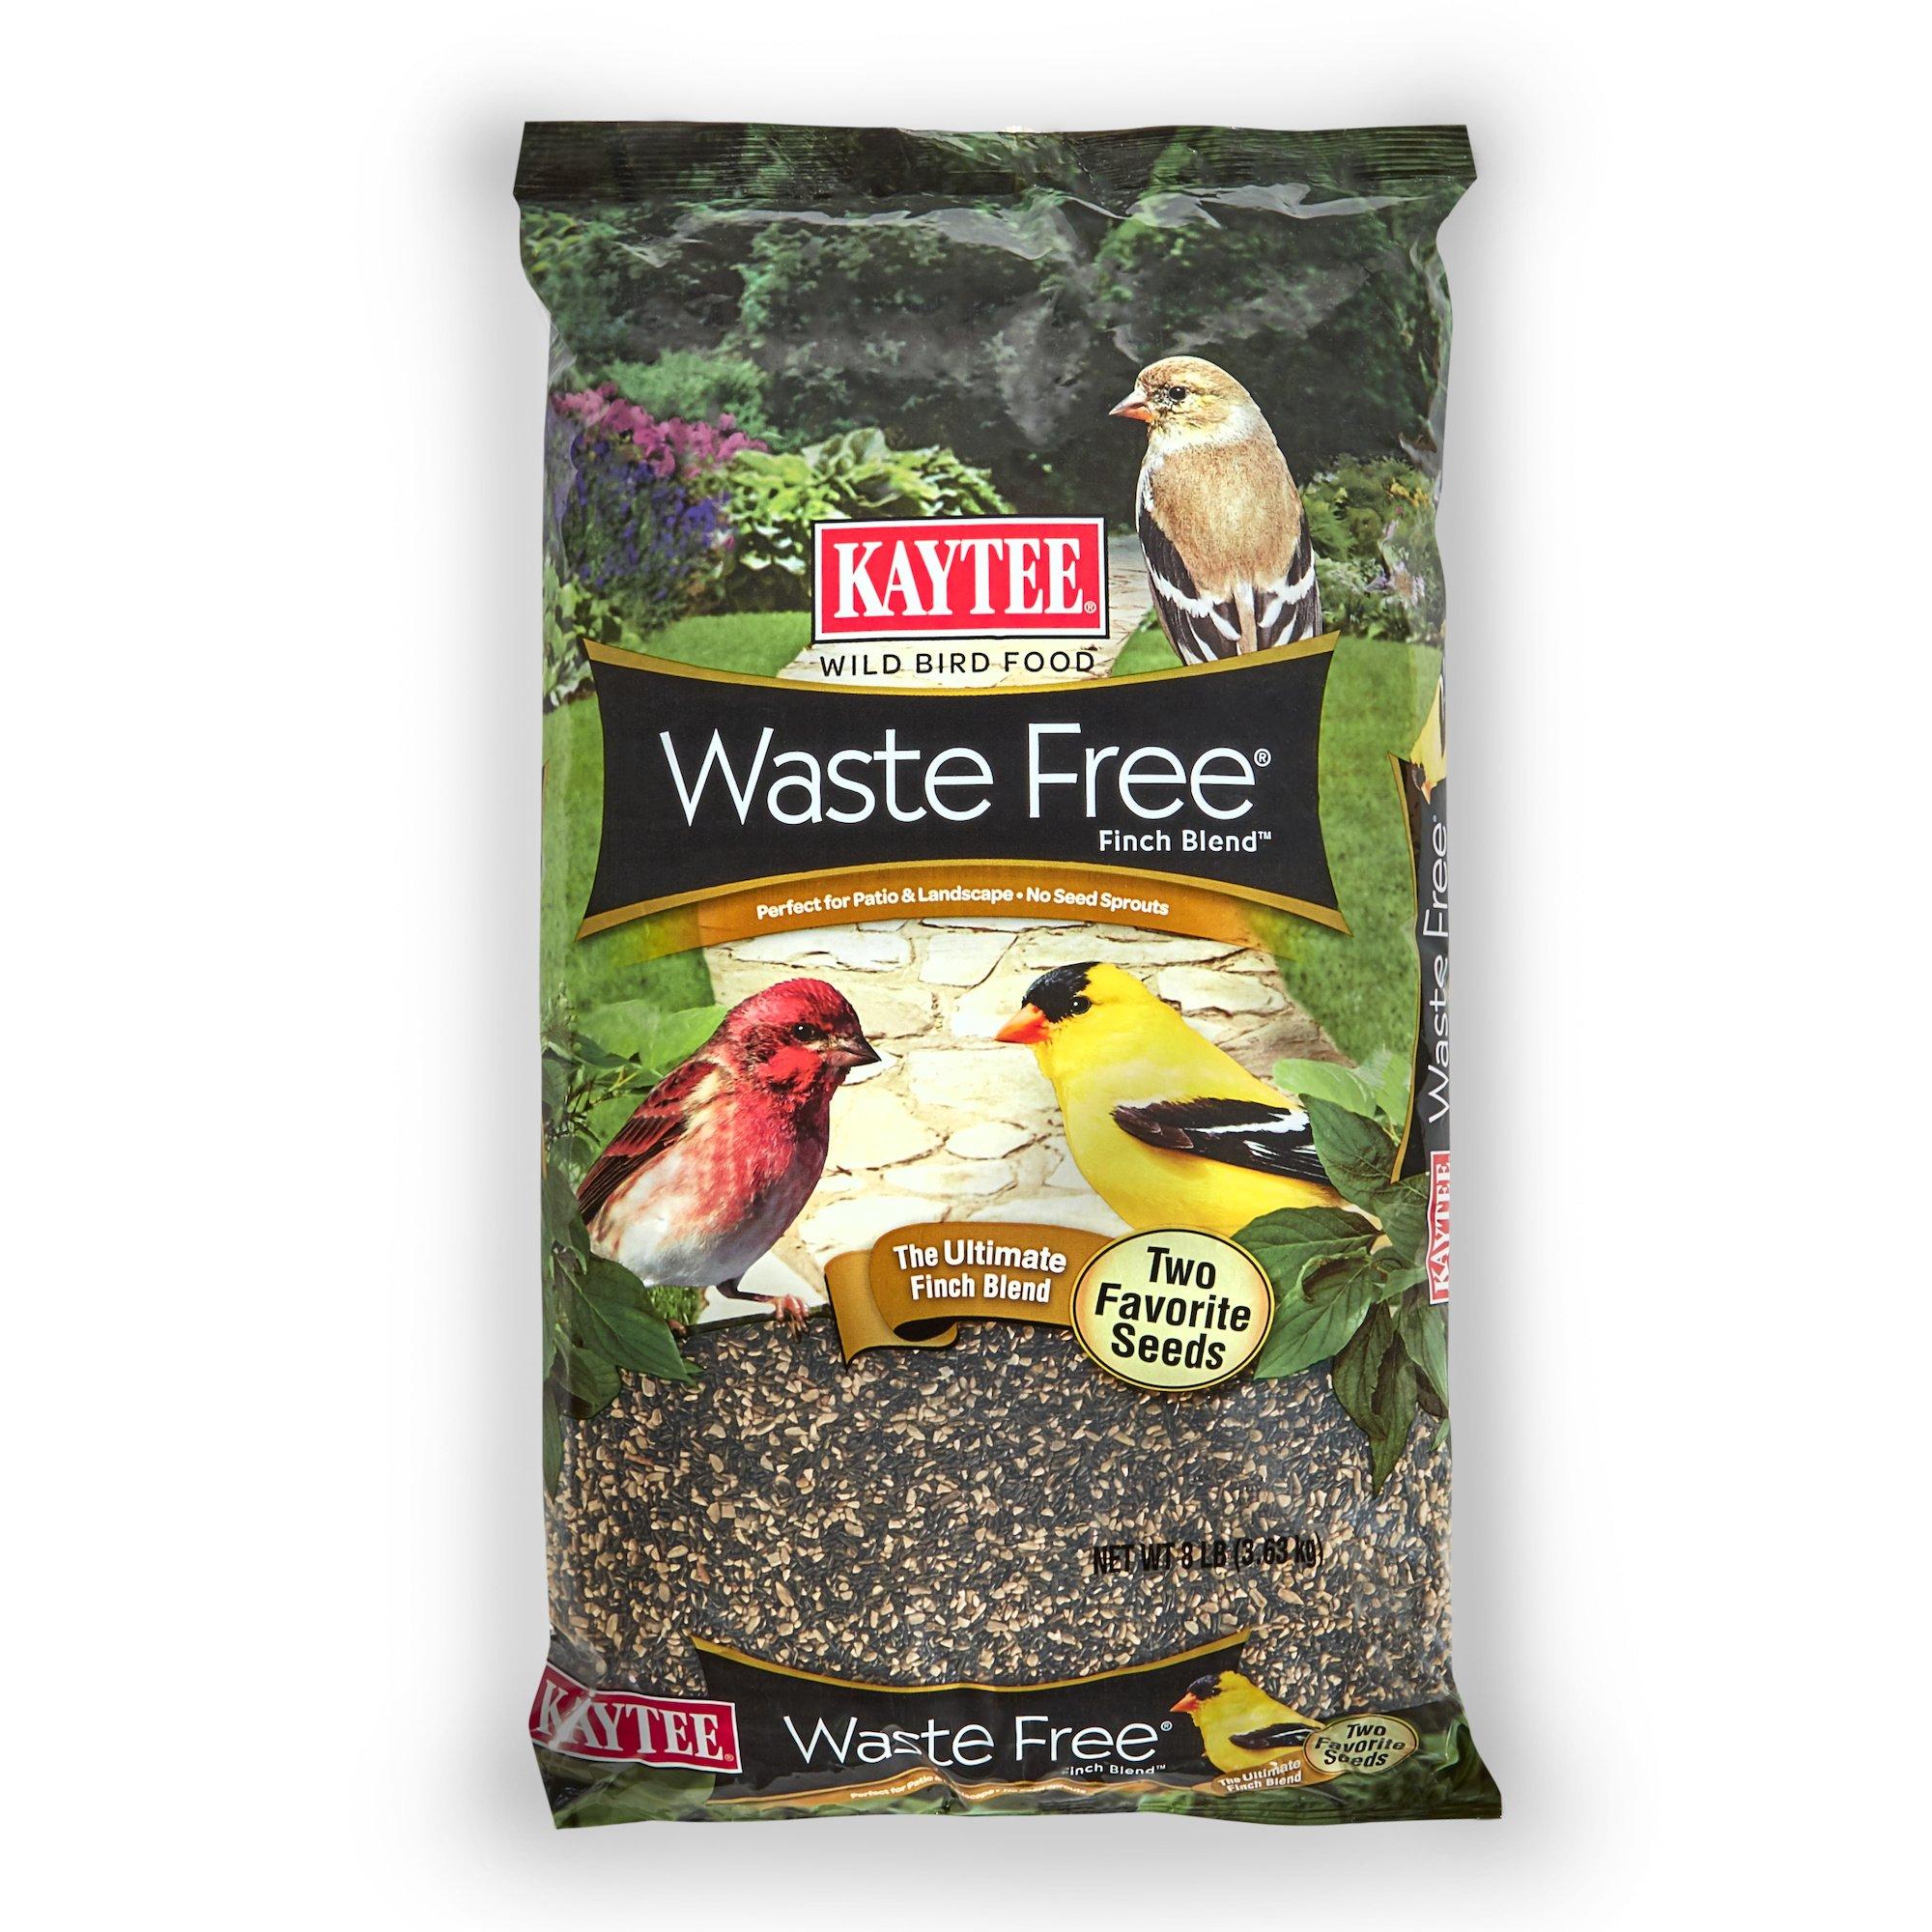 Kaytee Waste Free Finch Bird Seed Blend, 8-Pound by Kaytee